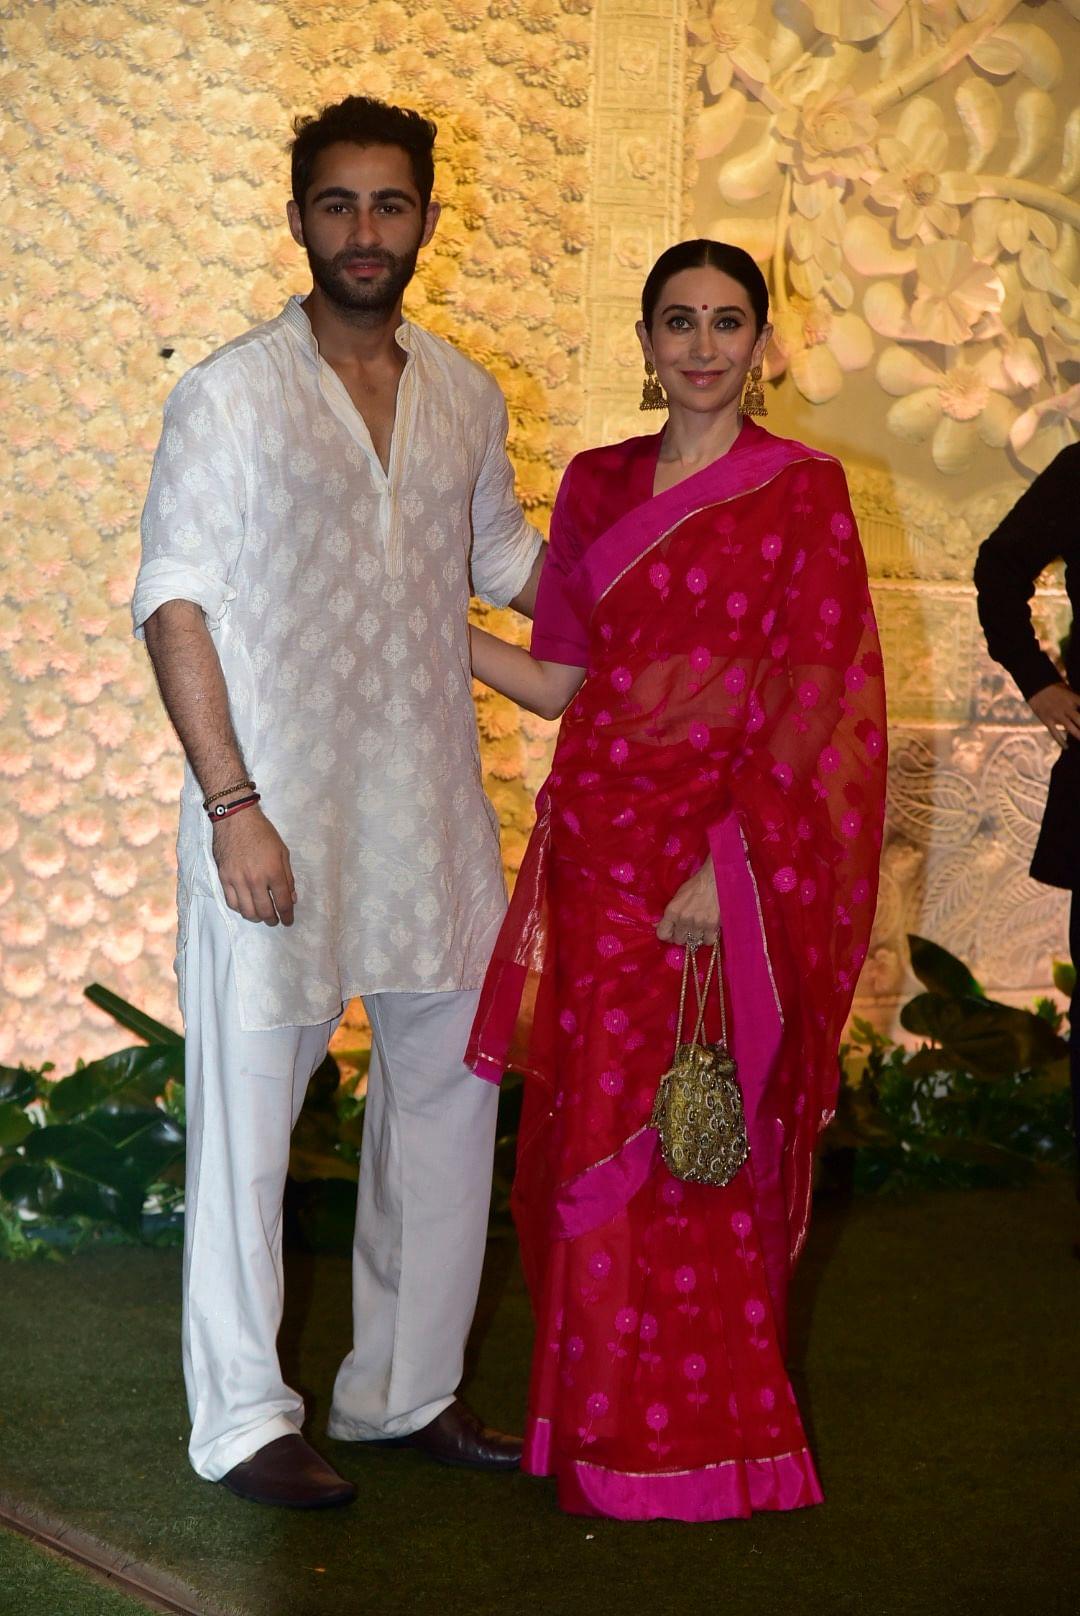 Karsima Kapoor along side cousin Aarman Jain at Ganpati celebrations